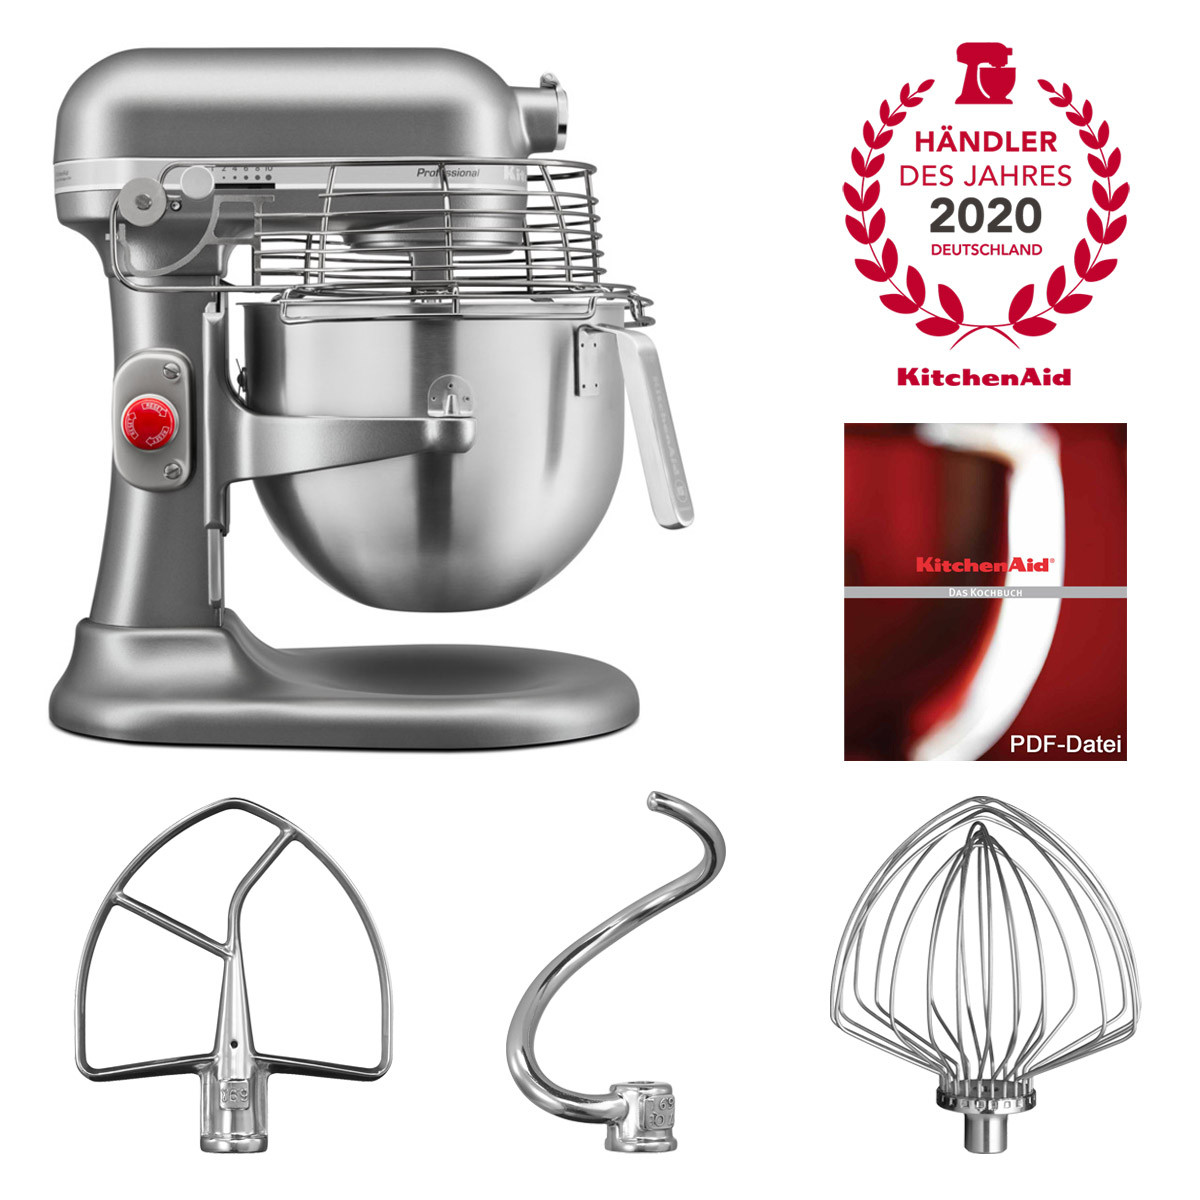 KitchenAid Artisan Küchenmaschine 6,9l PROFESSIONAL silber 5KSM7990XESL